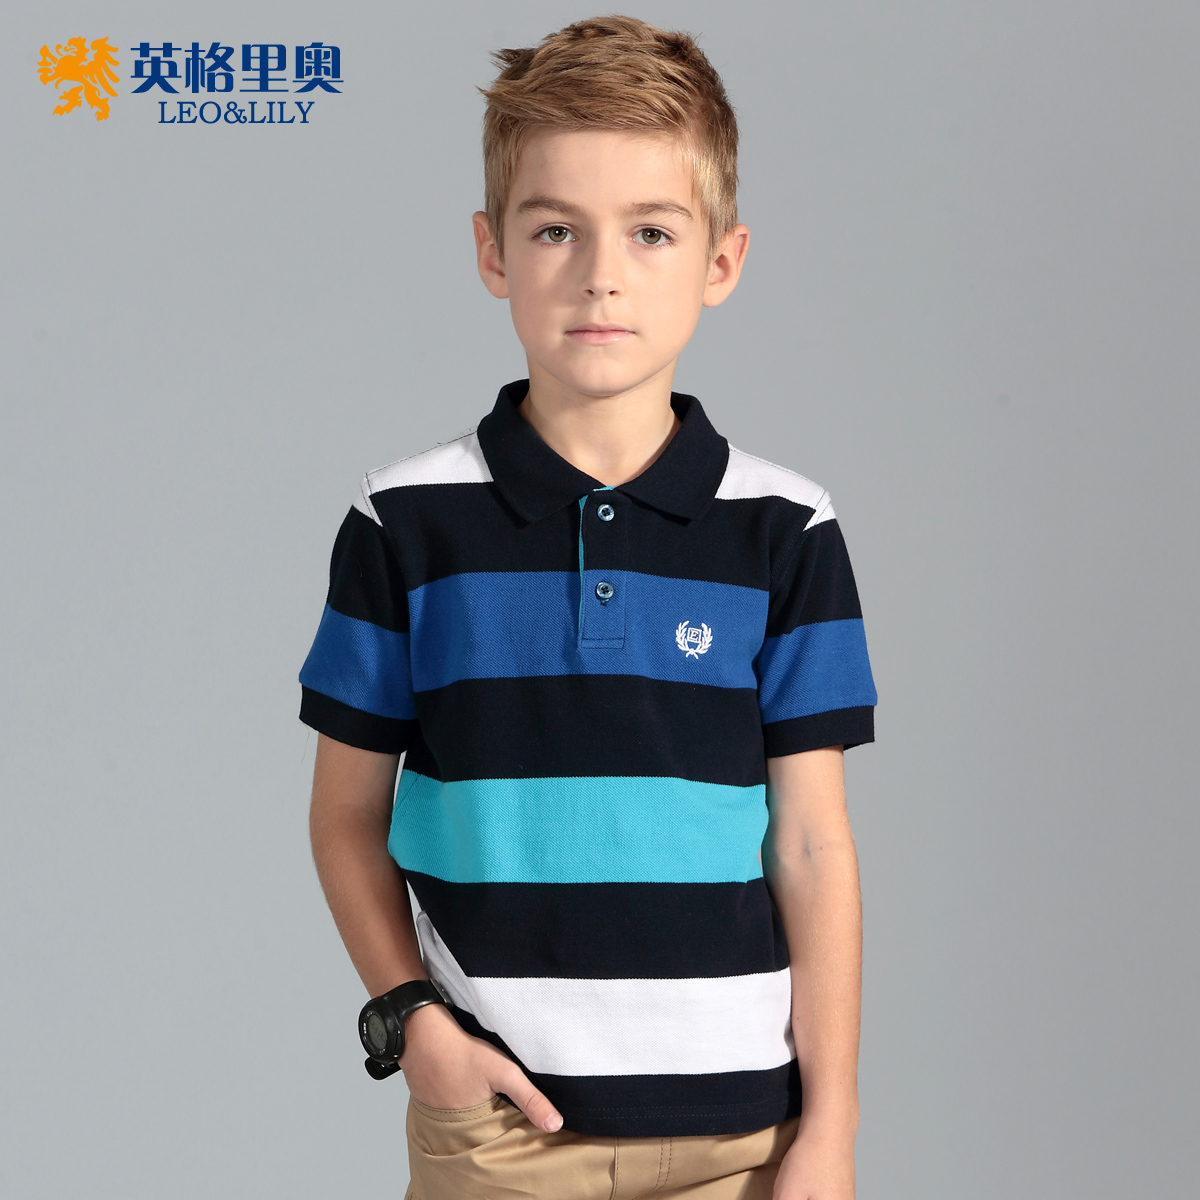 Group Wearing Polo Shirts